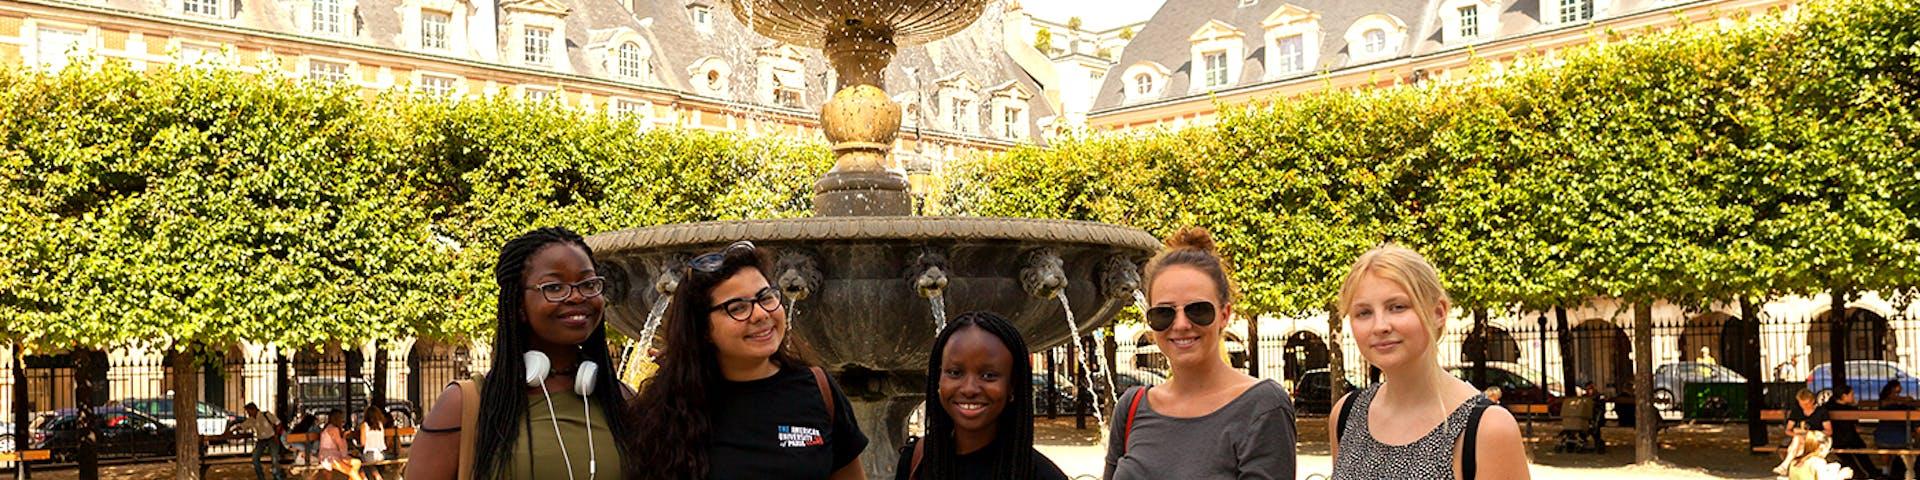 The American University of Paris - Paris - France